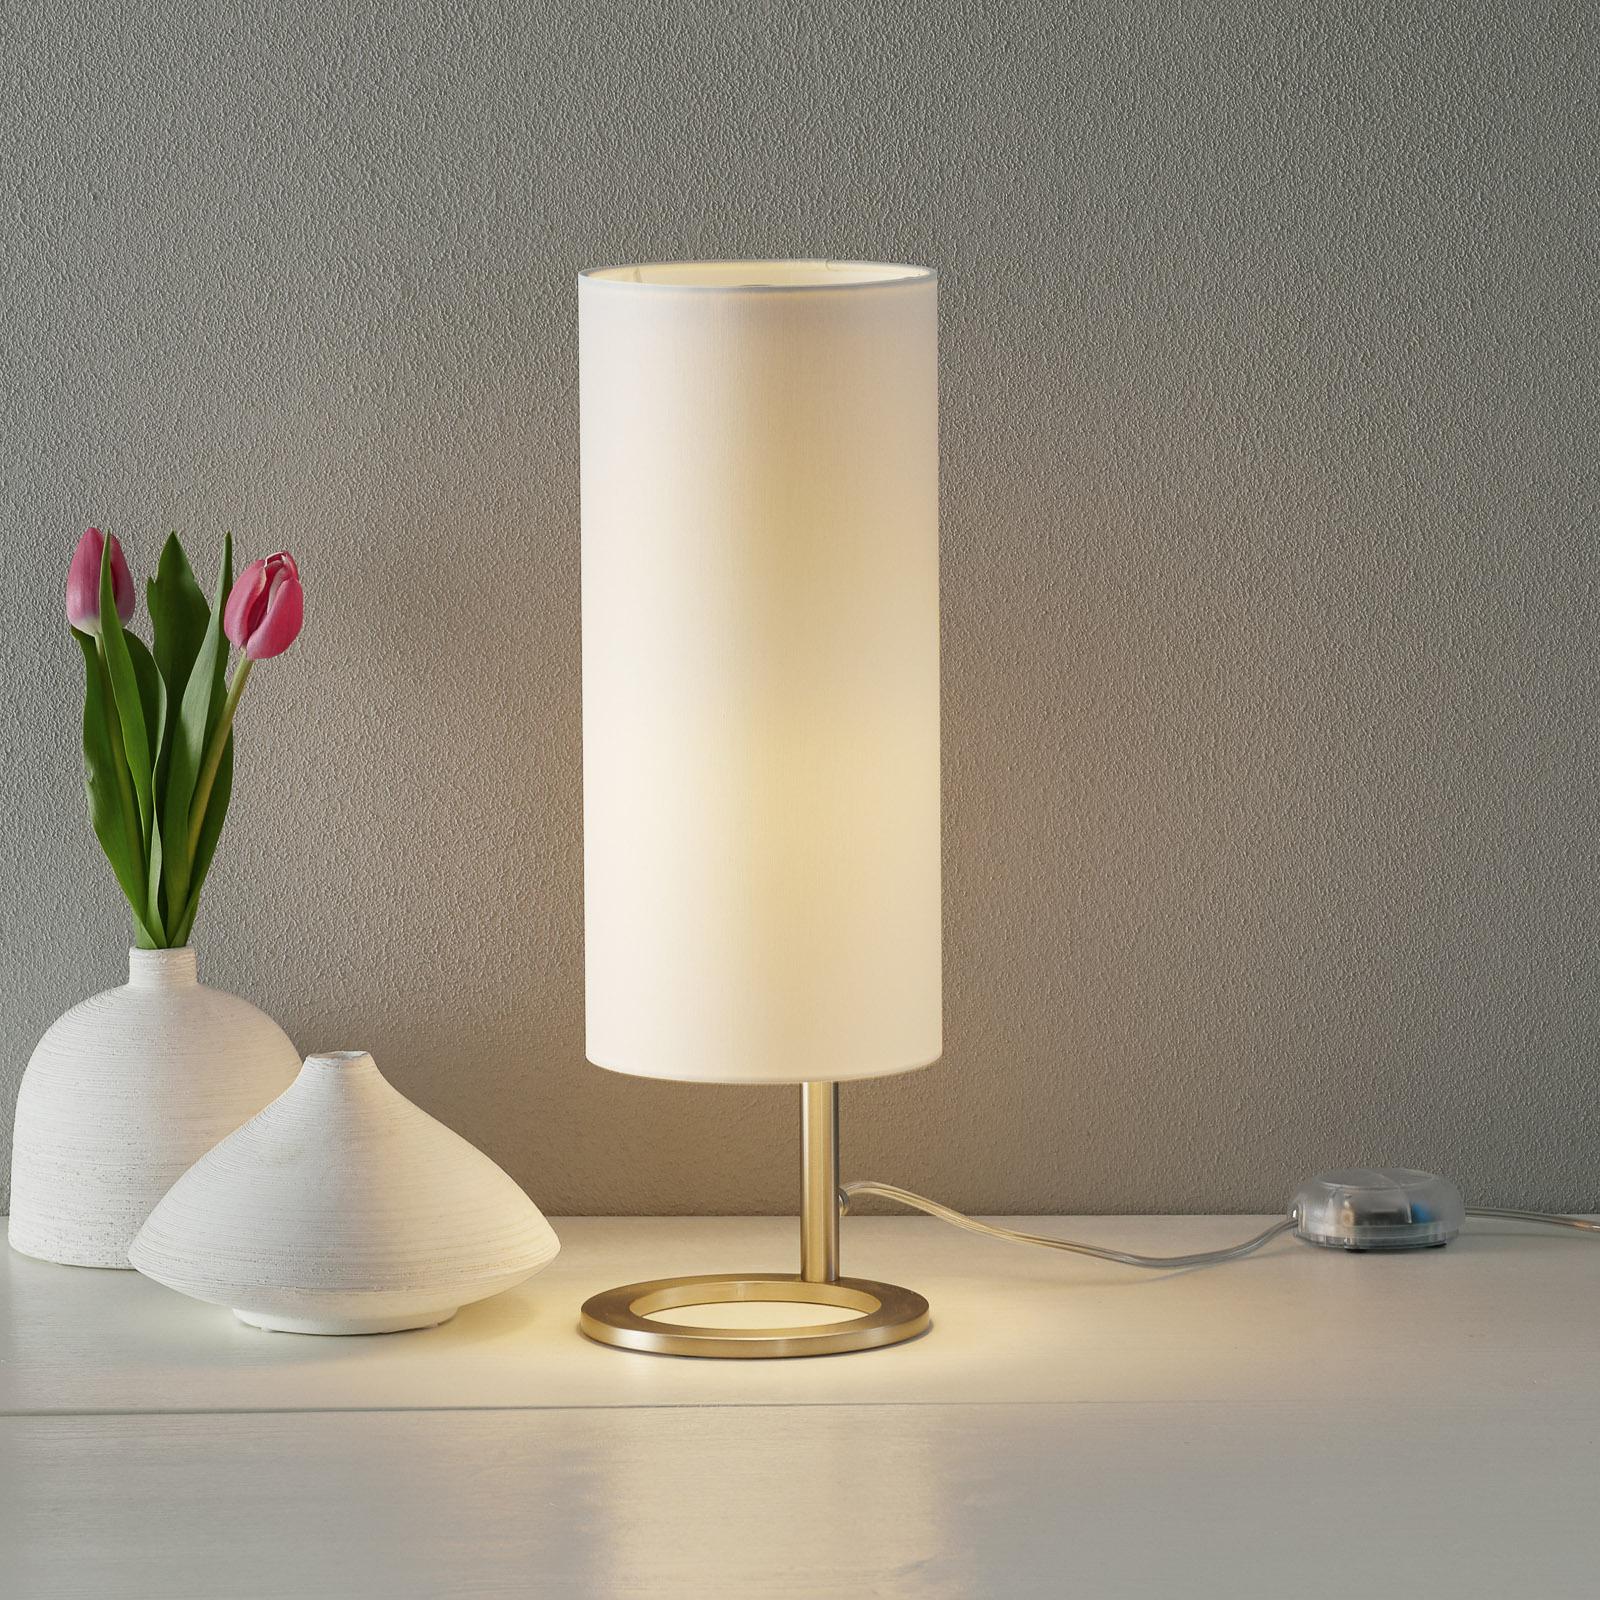 Lampe à poser KNAPSTEIN Mercy intensité variable